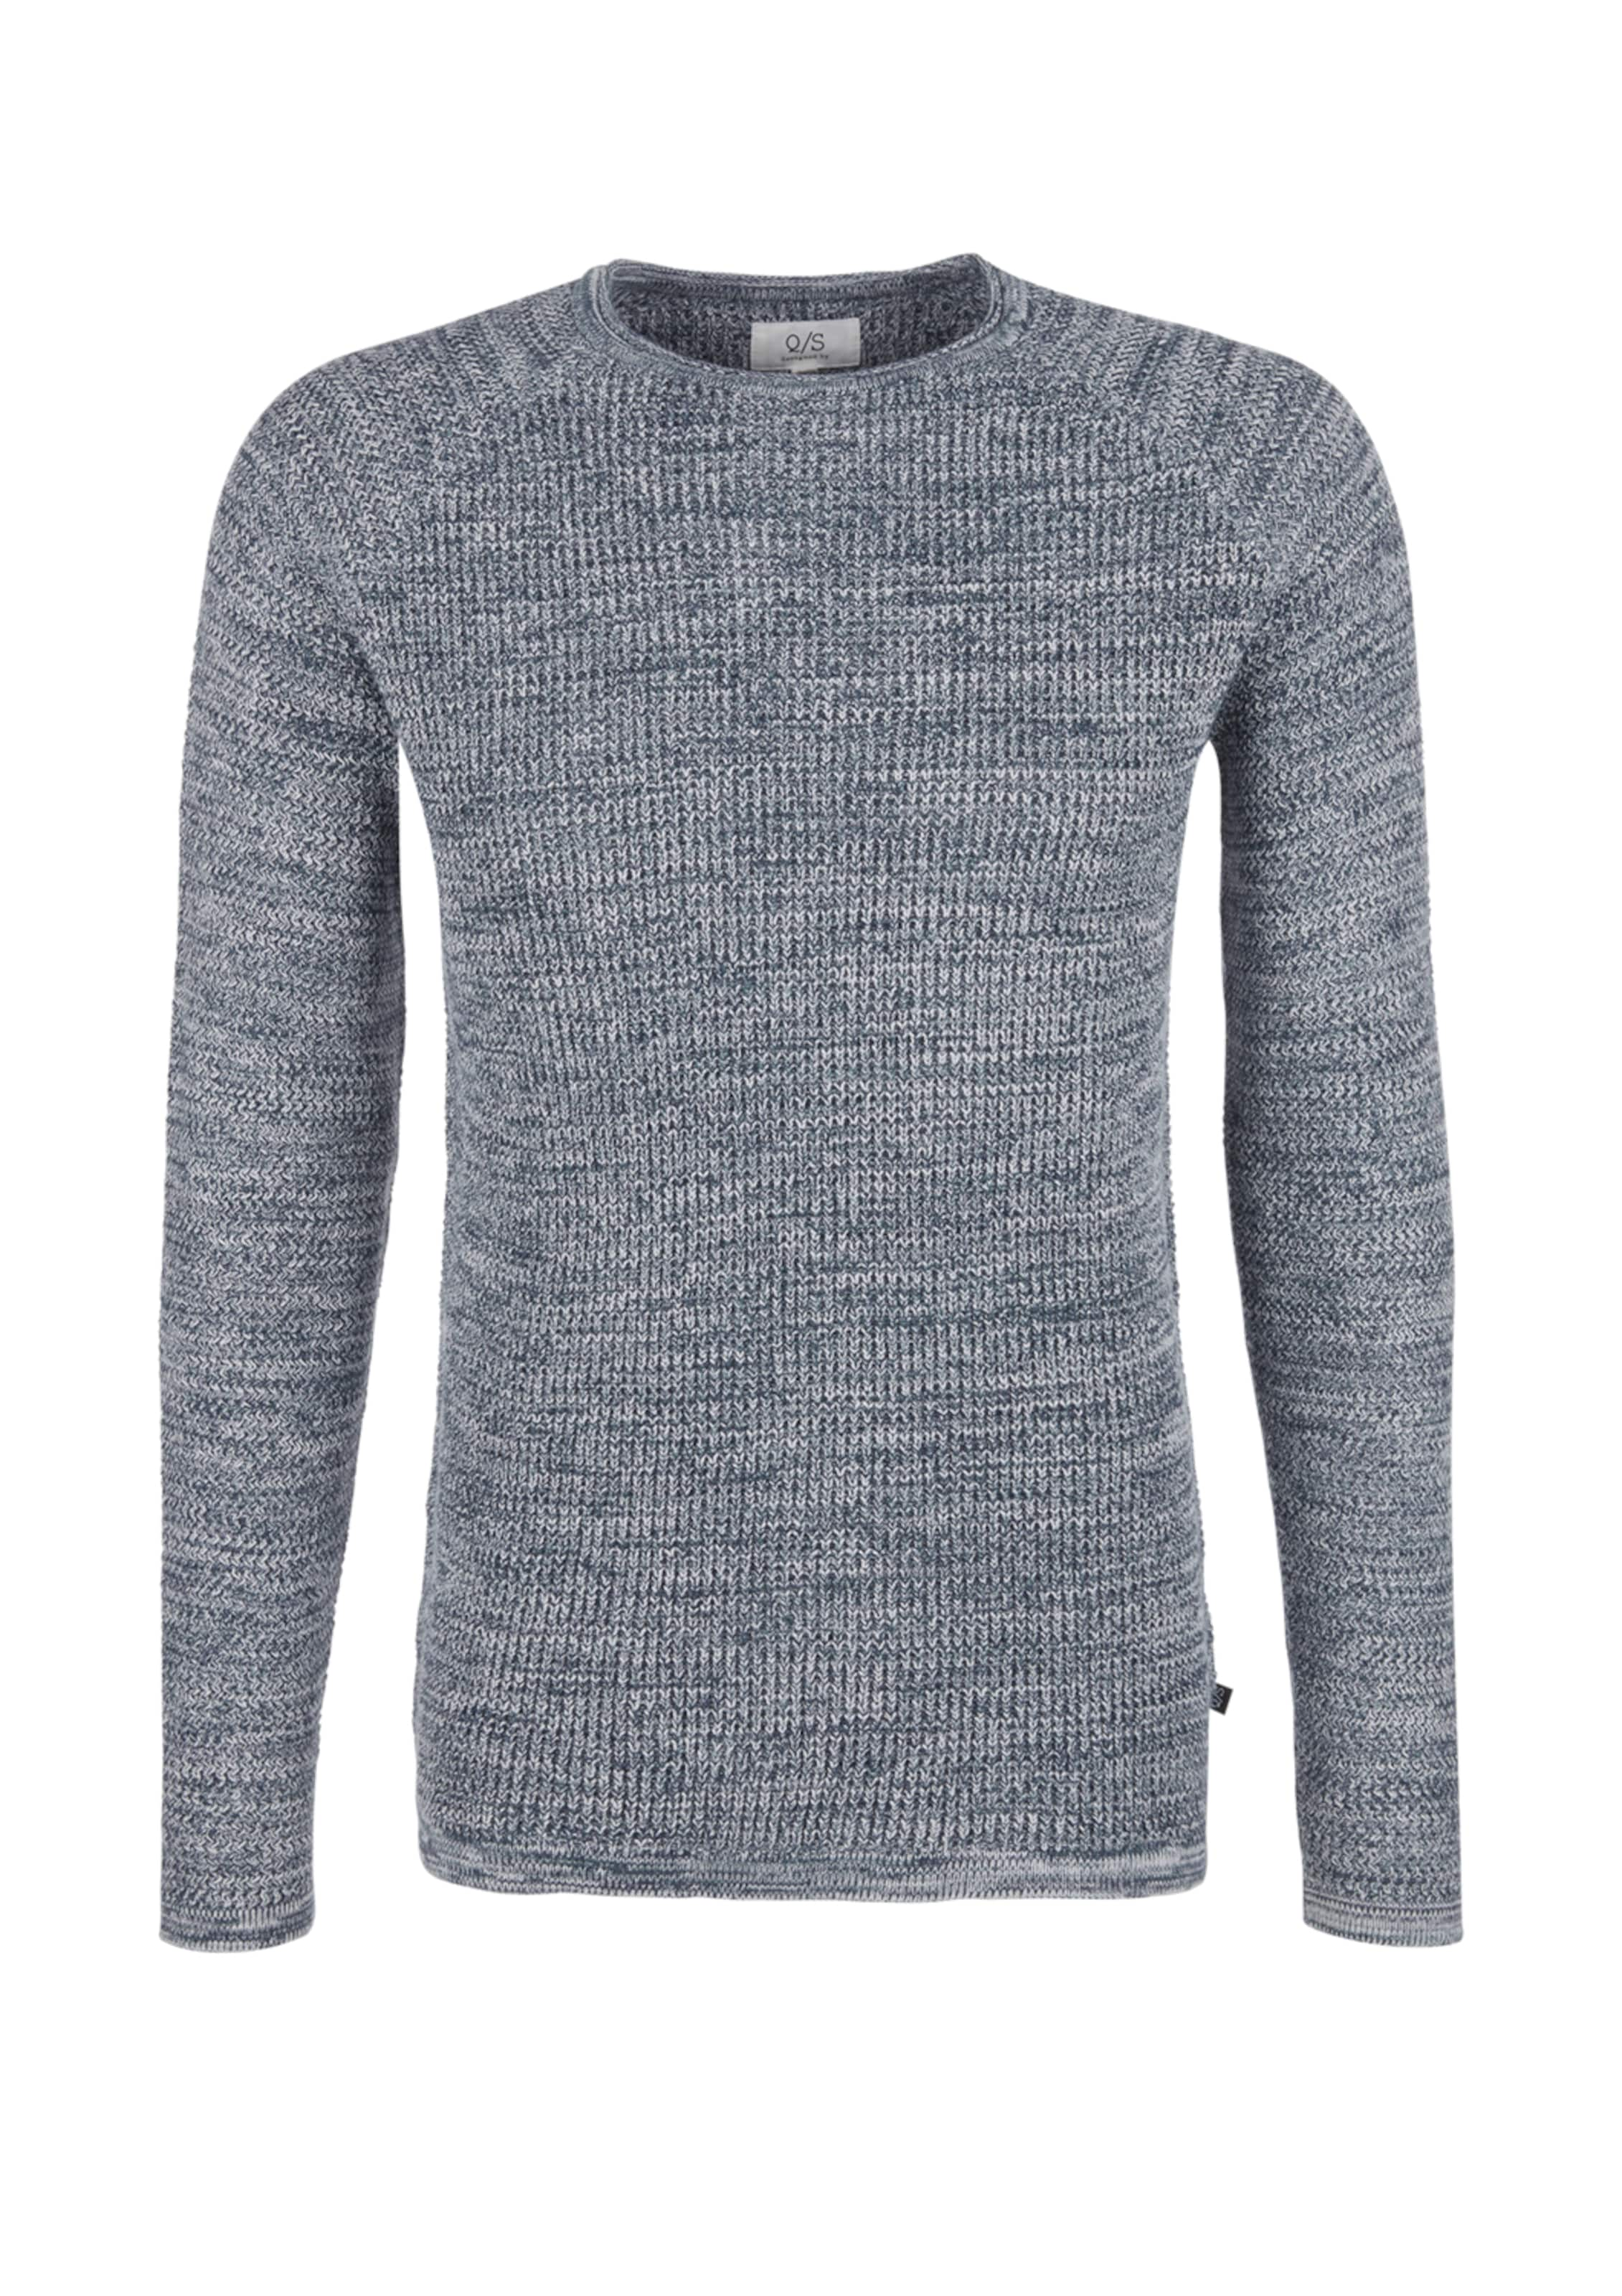 Q Rauchblau By In Pullover Designed s X8wkn0OP